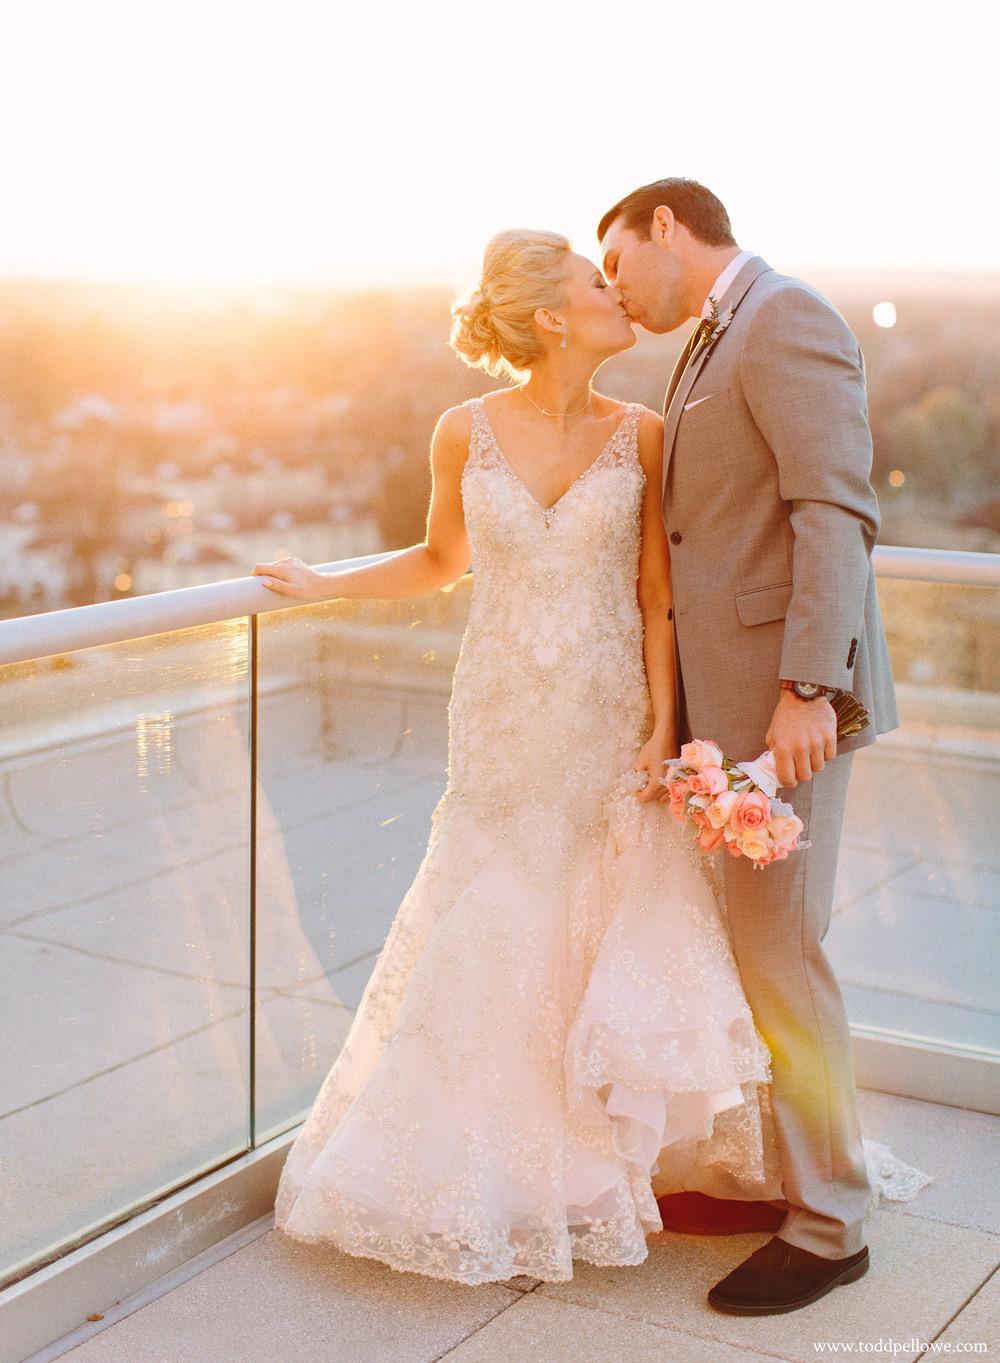 14-glassworks-wedding-photography-216.jpg